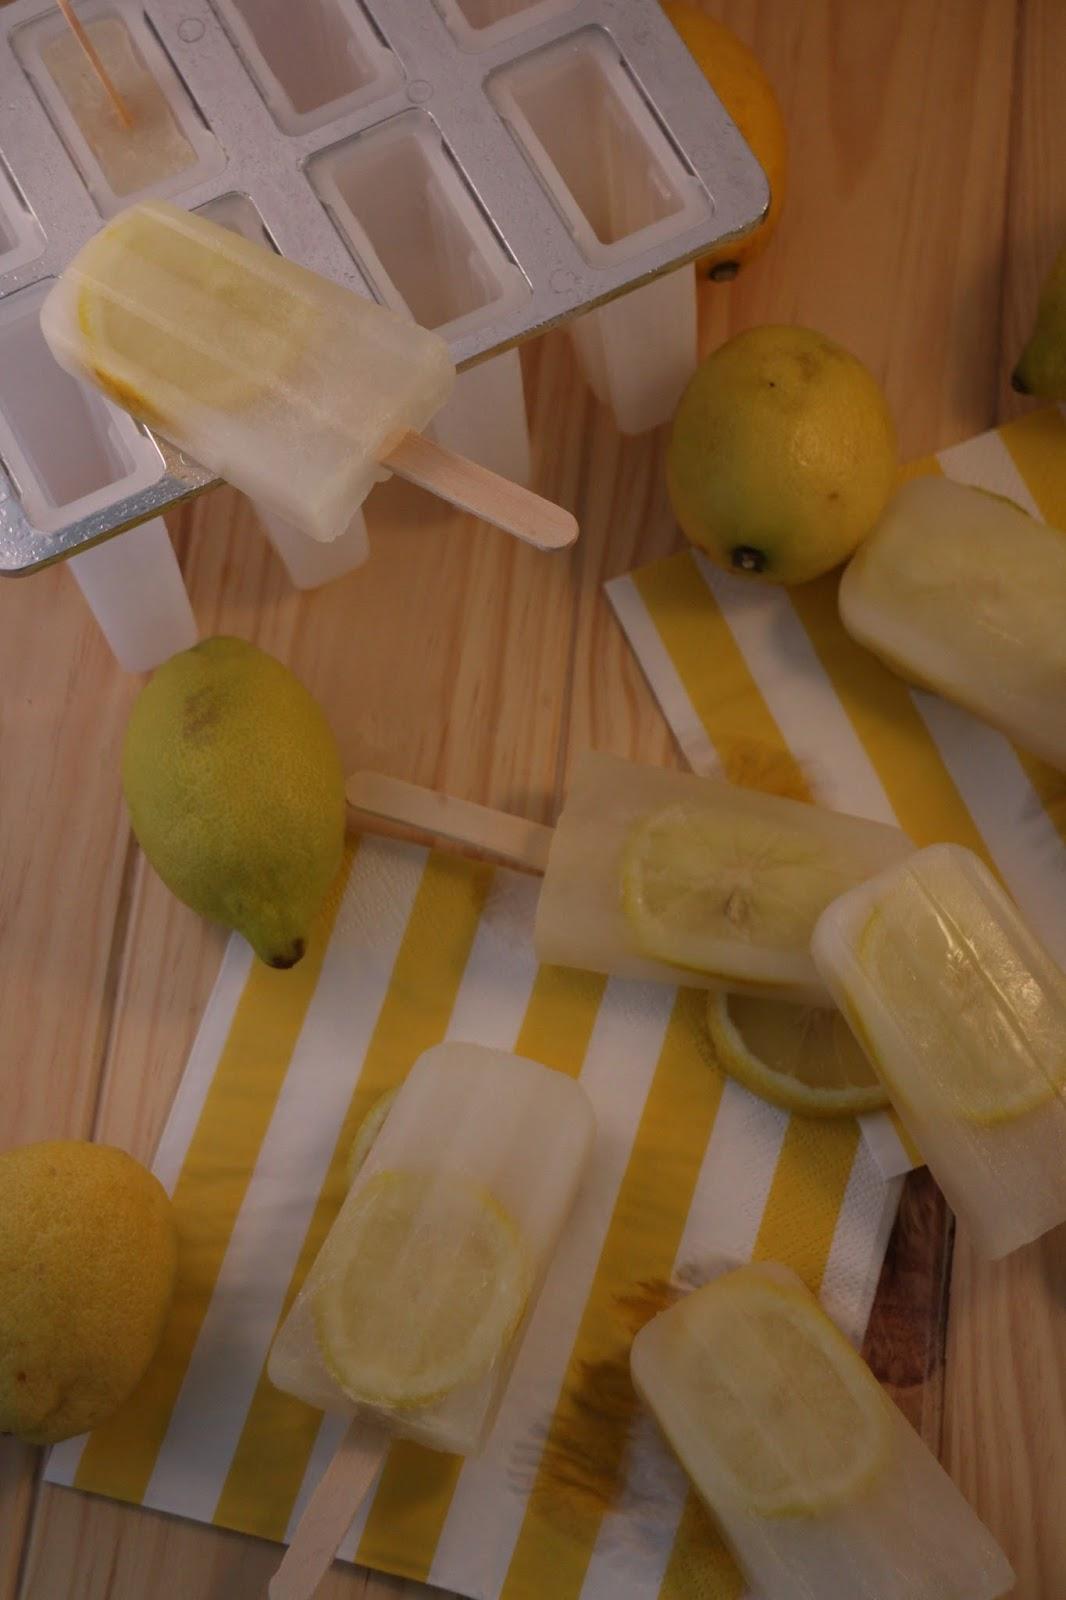 polos-de-ginebra-con-limon, gin-lemon-popsicles